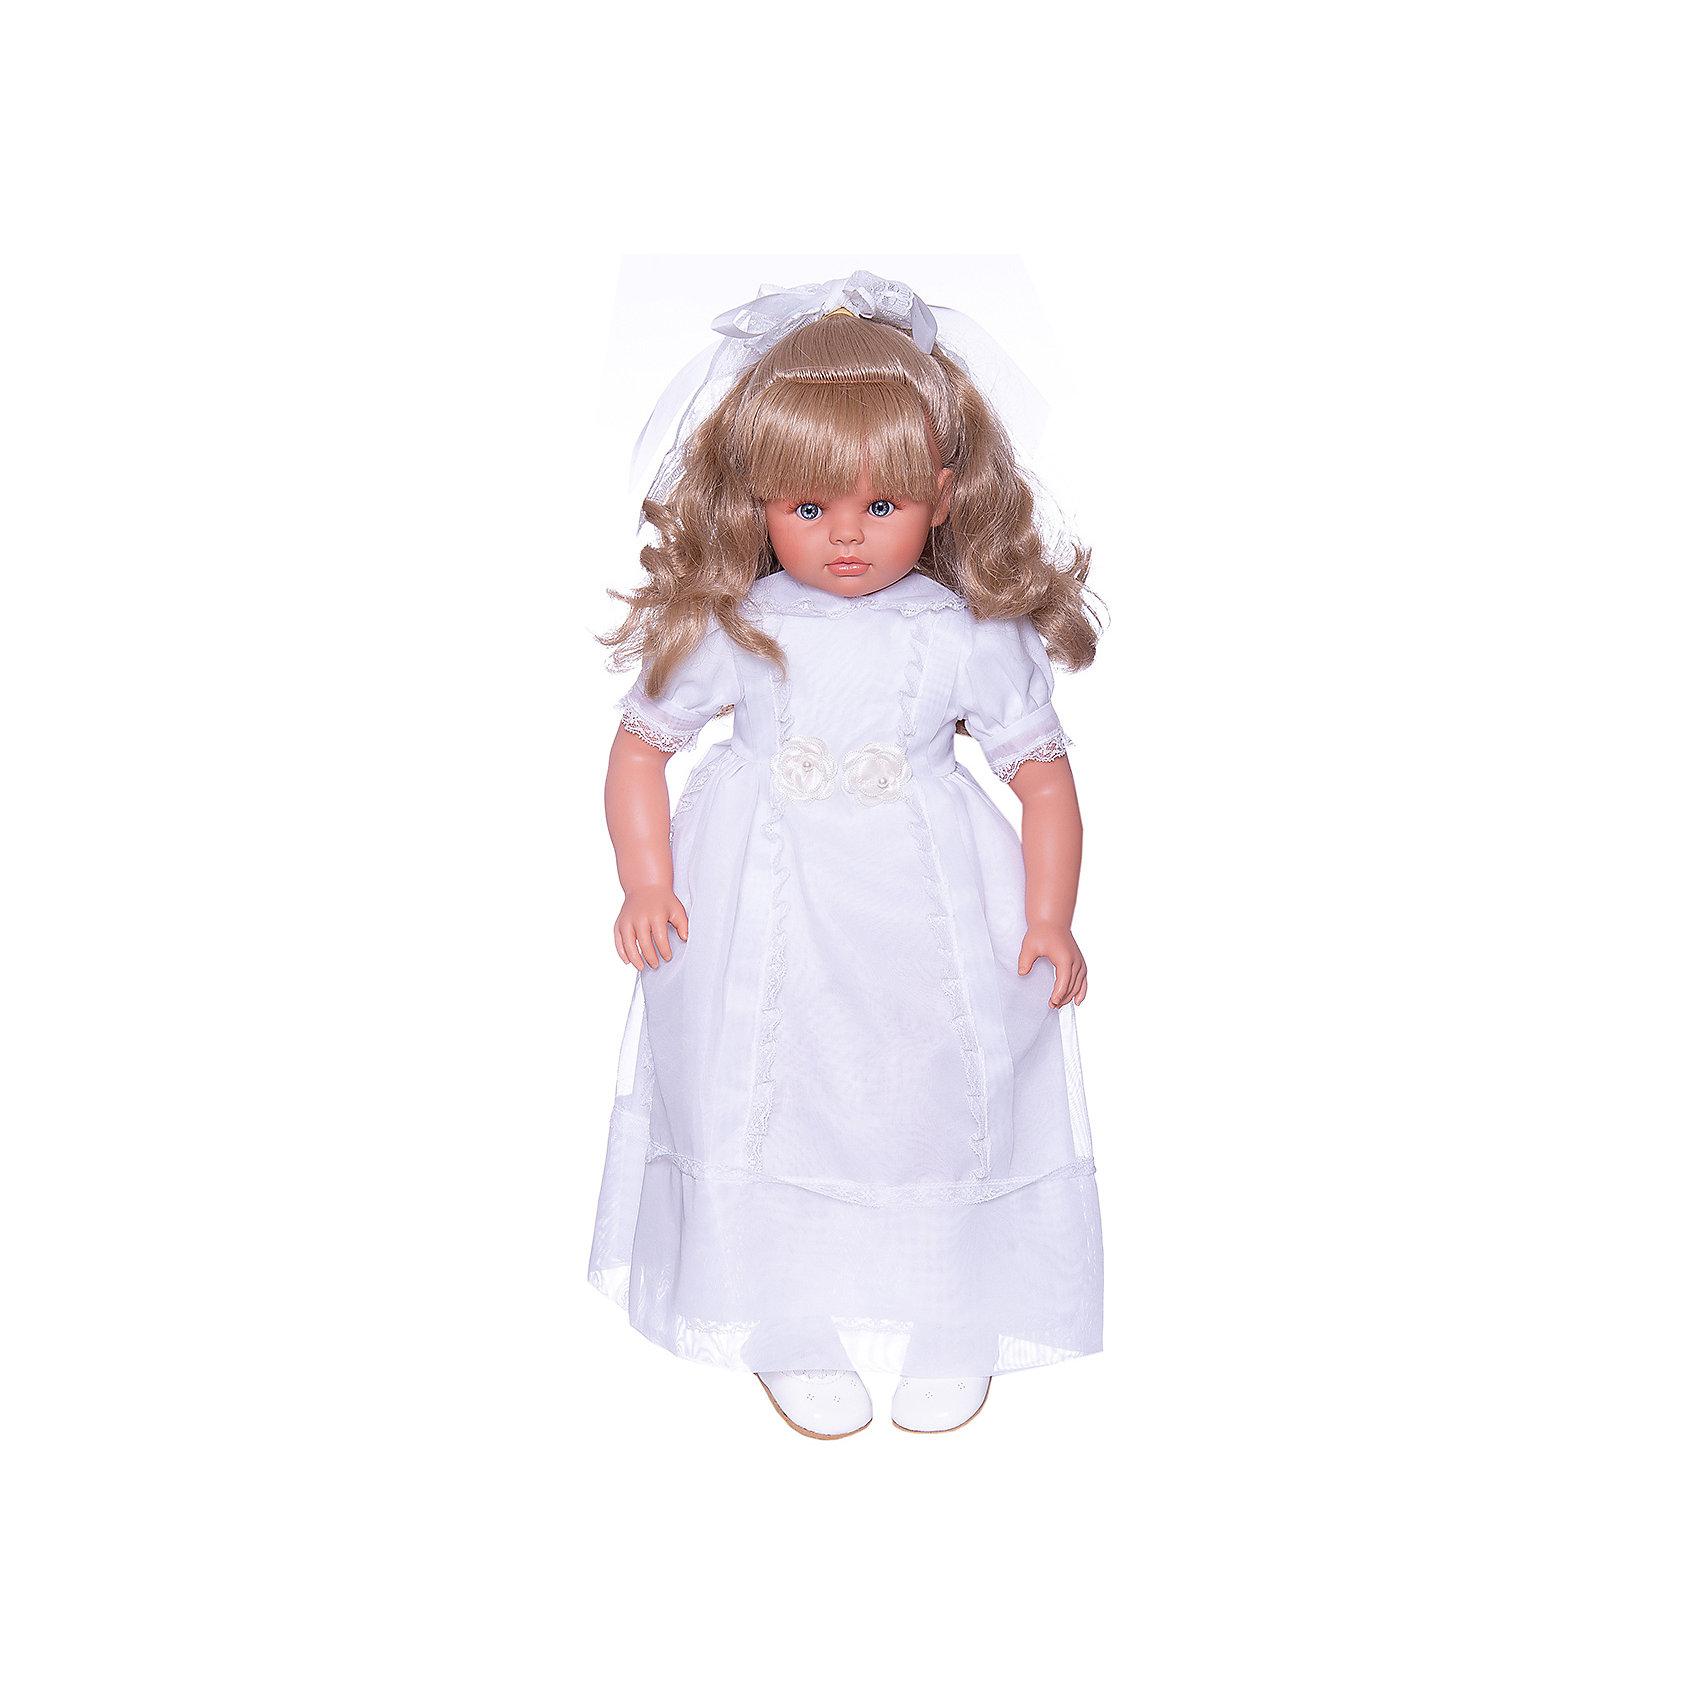 Кукла Asi Пепа 60 см, арт 280090с по цене 12 990